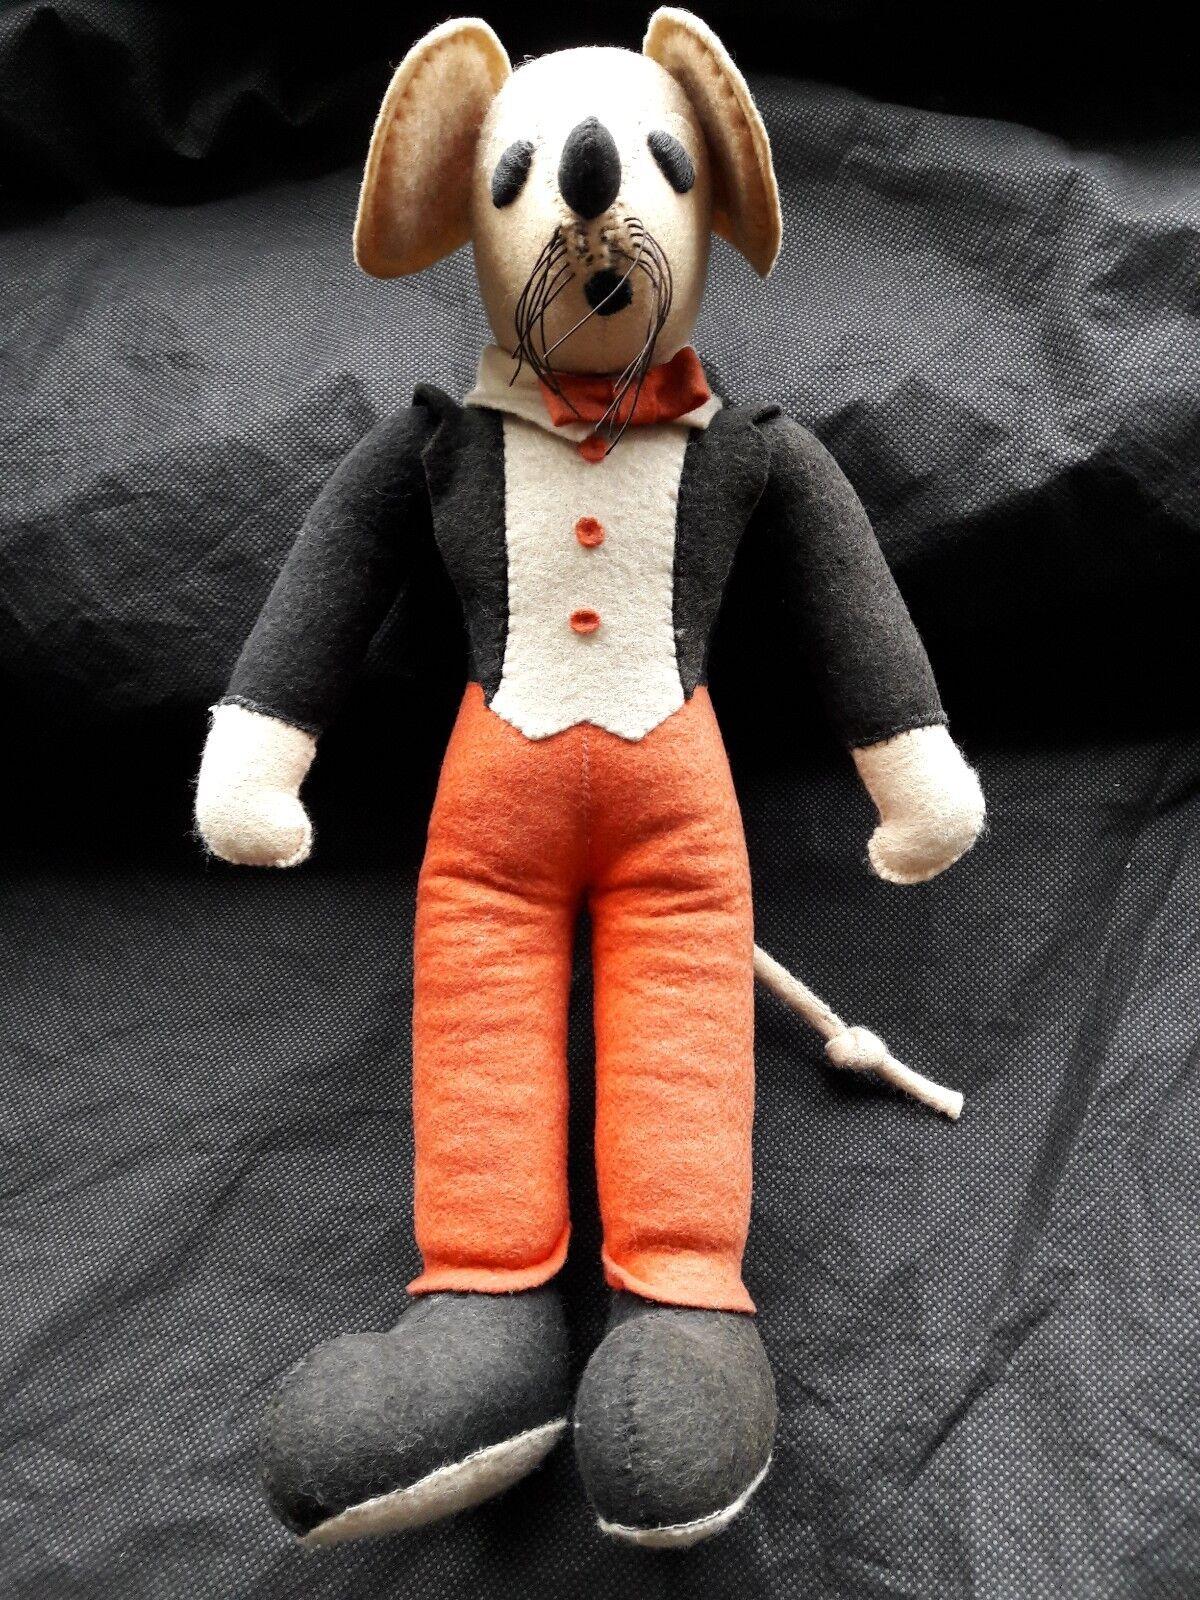 Teddy Teddy Teddy Tails rare vintage soft toy figure circa 1920's 7a306a